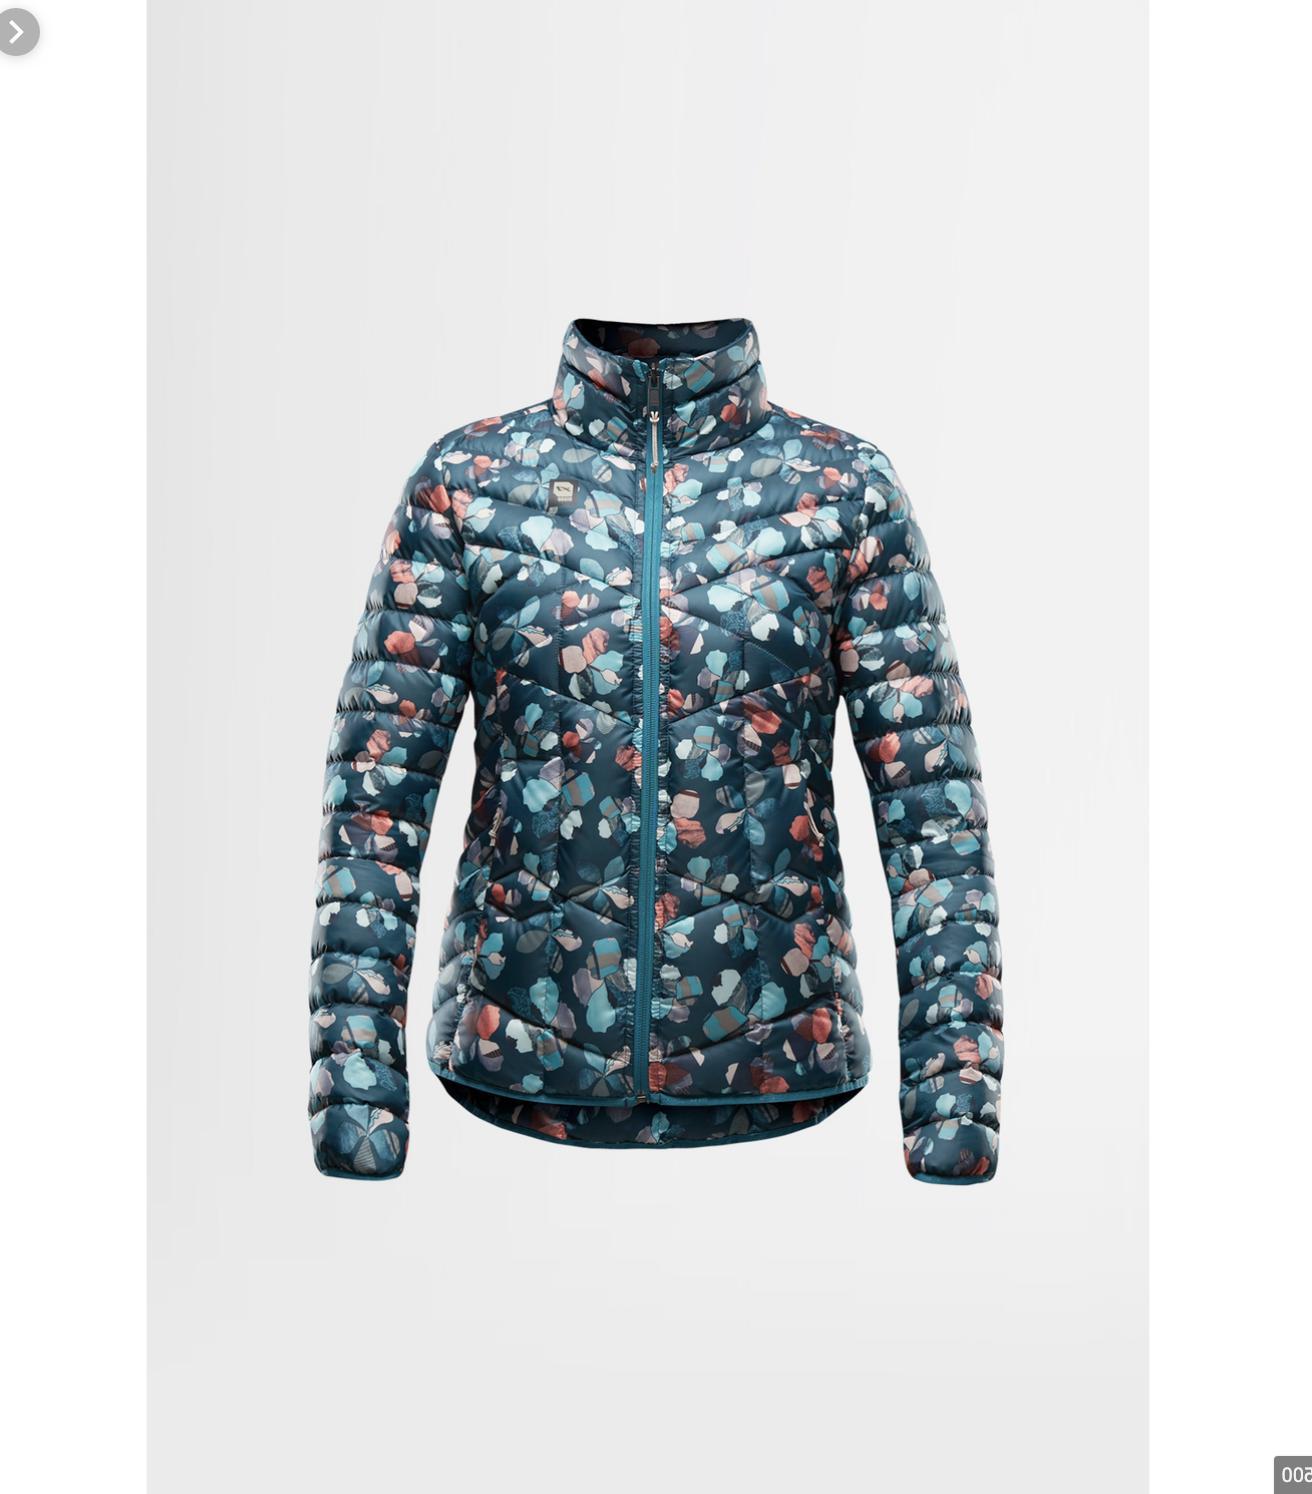 Orage Down Ski/Snowbaord Jacket size xl -